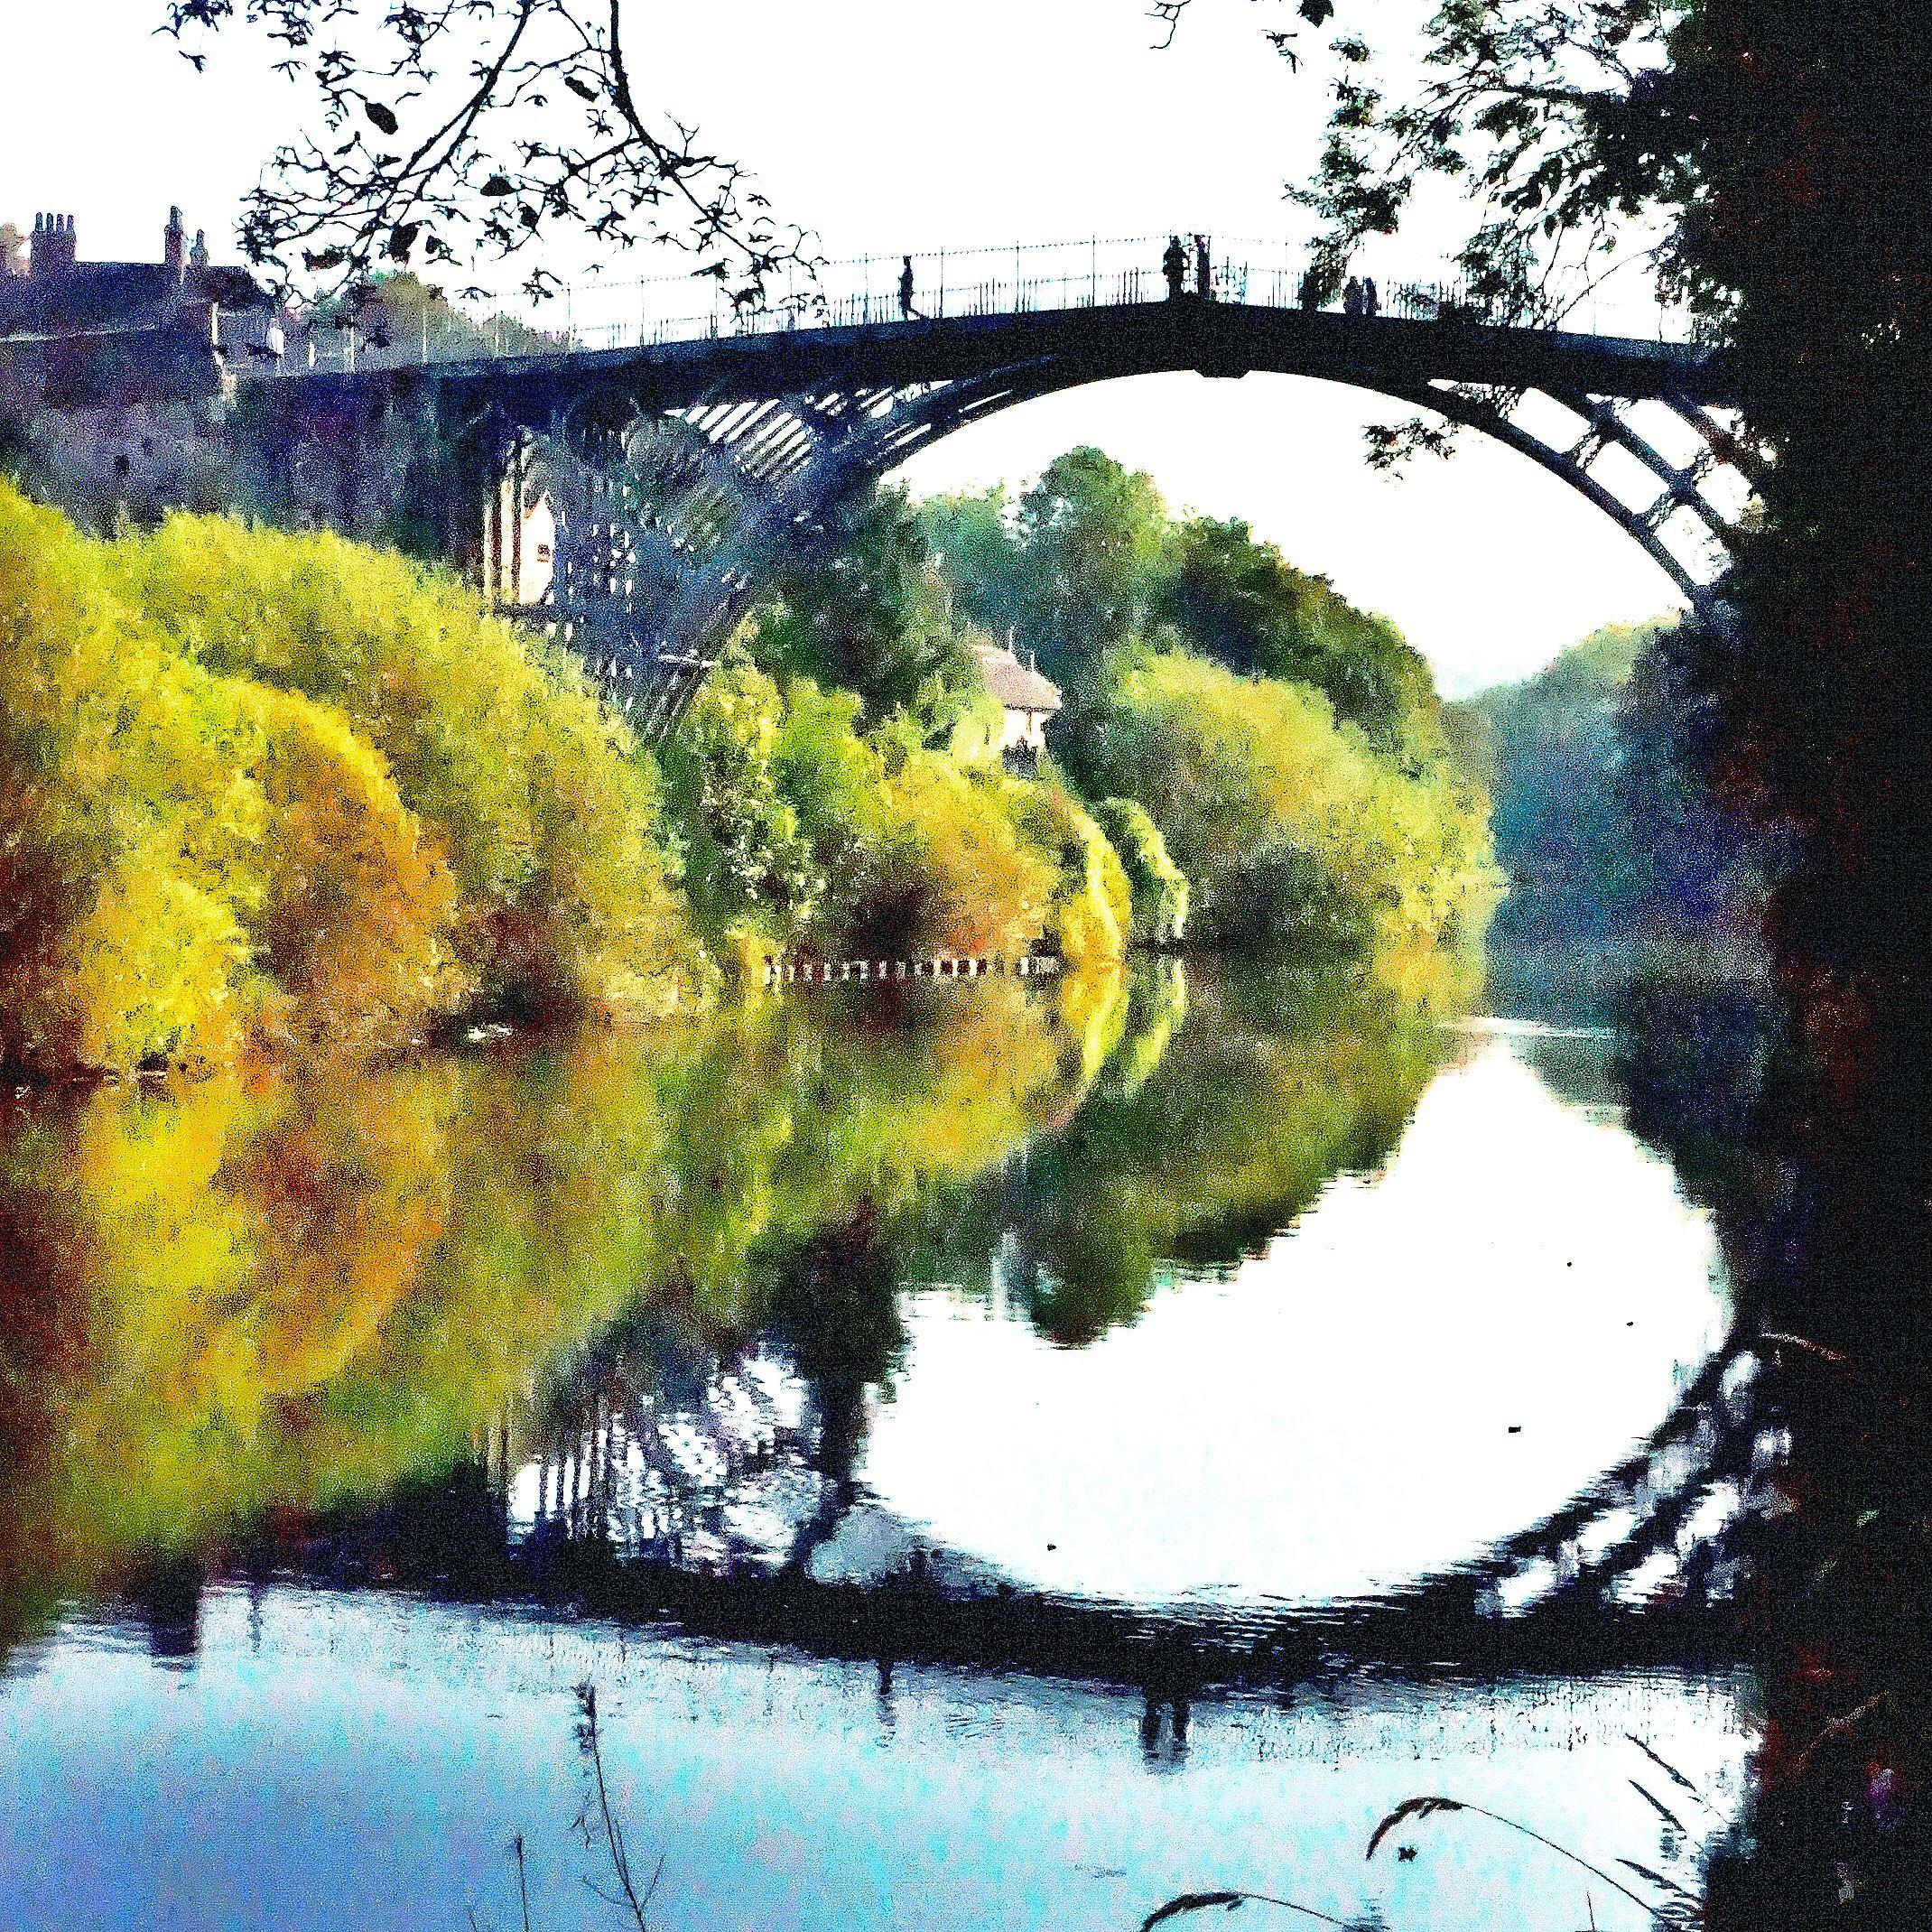 Ironbridge...birthplace of the industrial revolution.